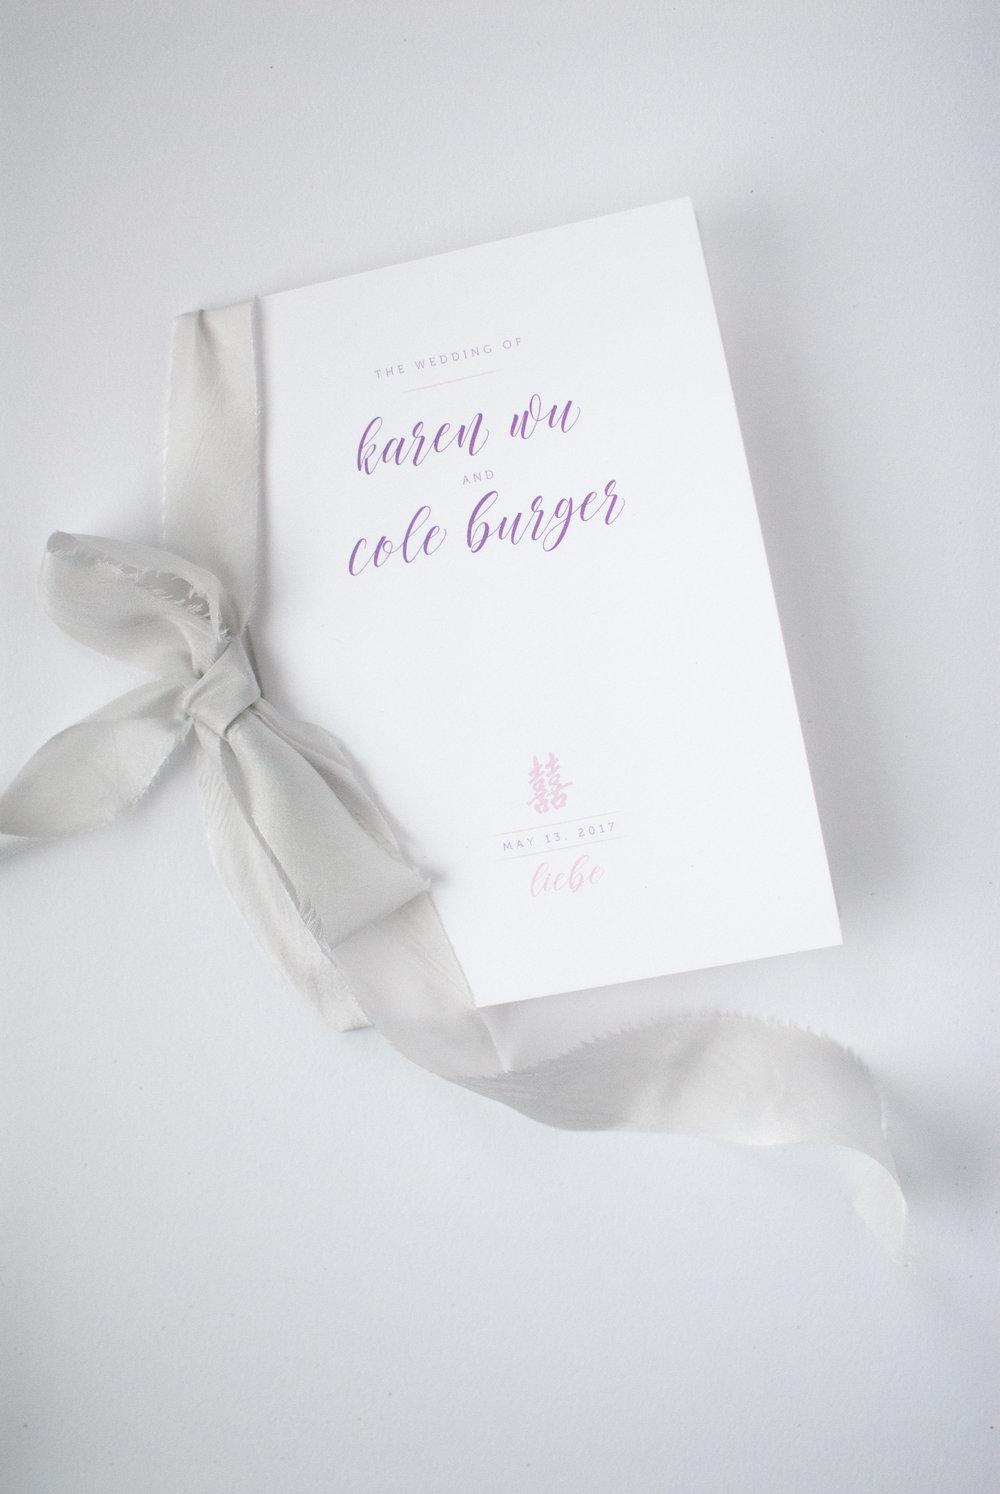 hj-wedding-invitations-karen-cole-12.jpg